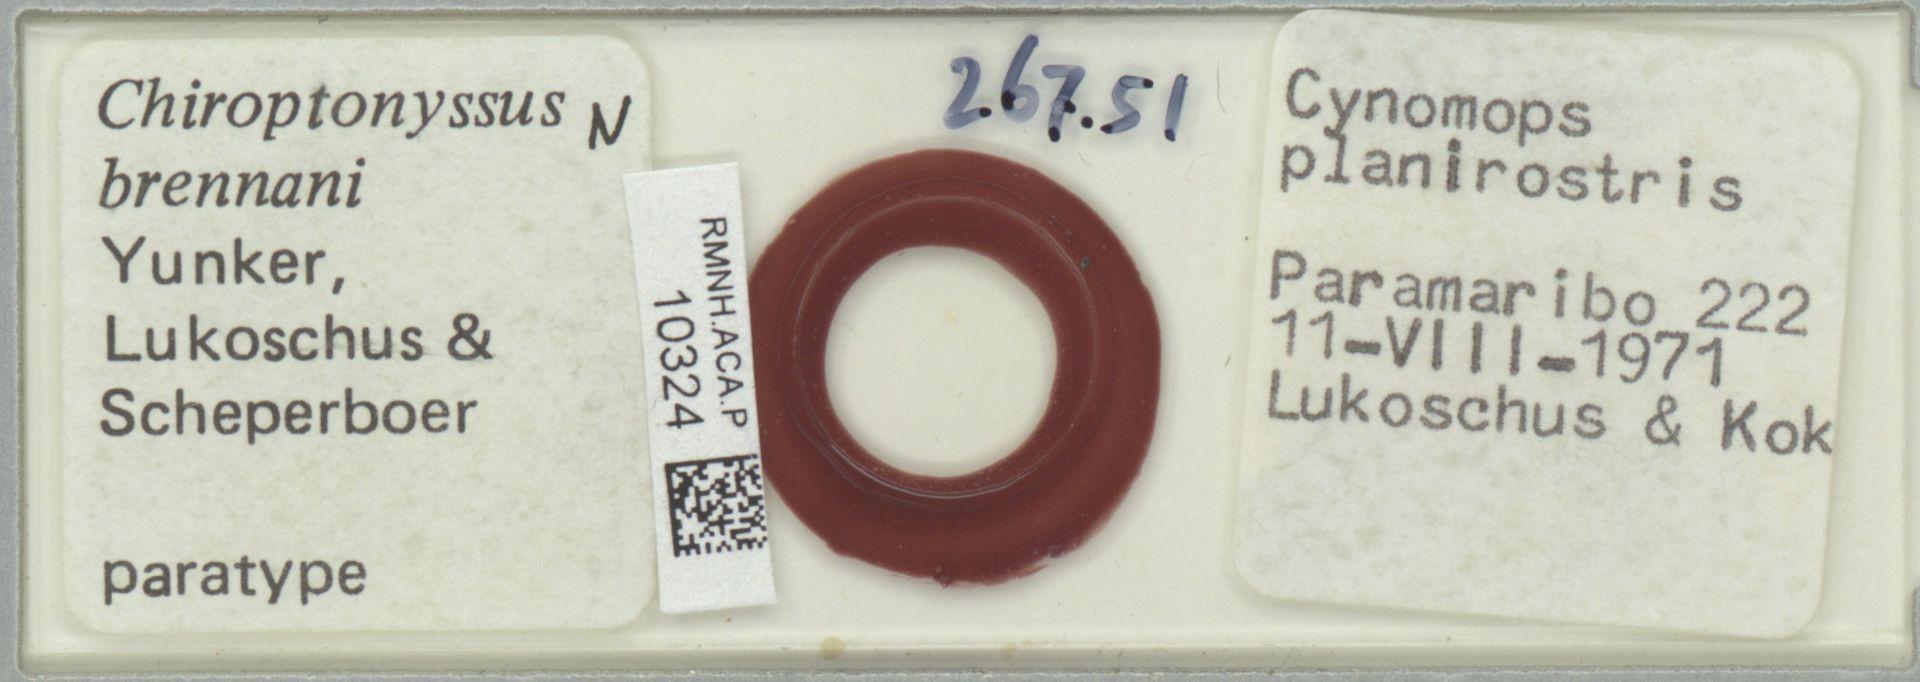 RMNH.ACA.P.10324 | Chiroptonyssus brennani Yunker, Lukoschus & Scheperboer